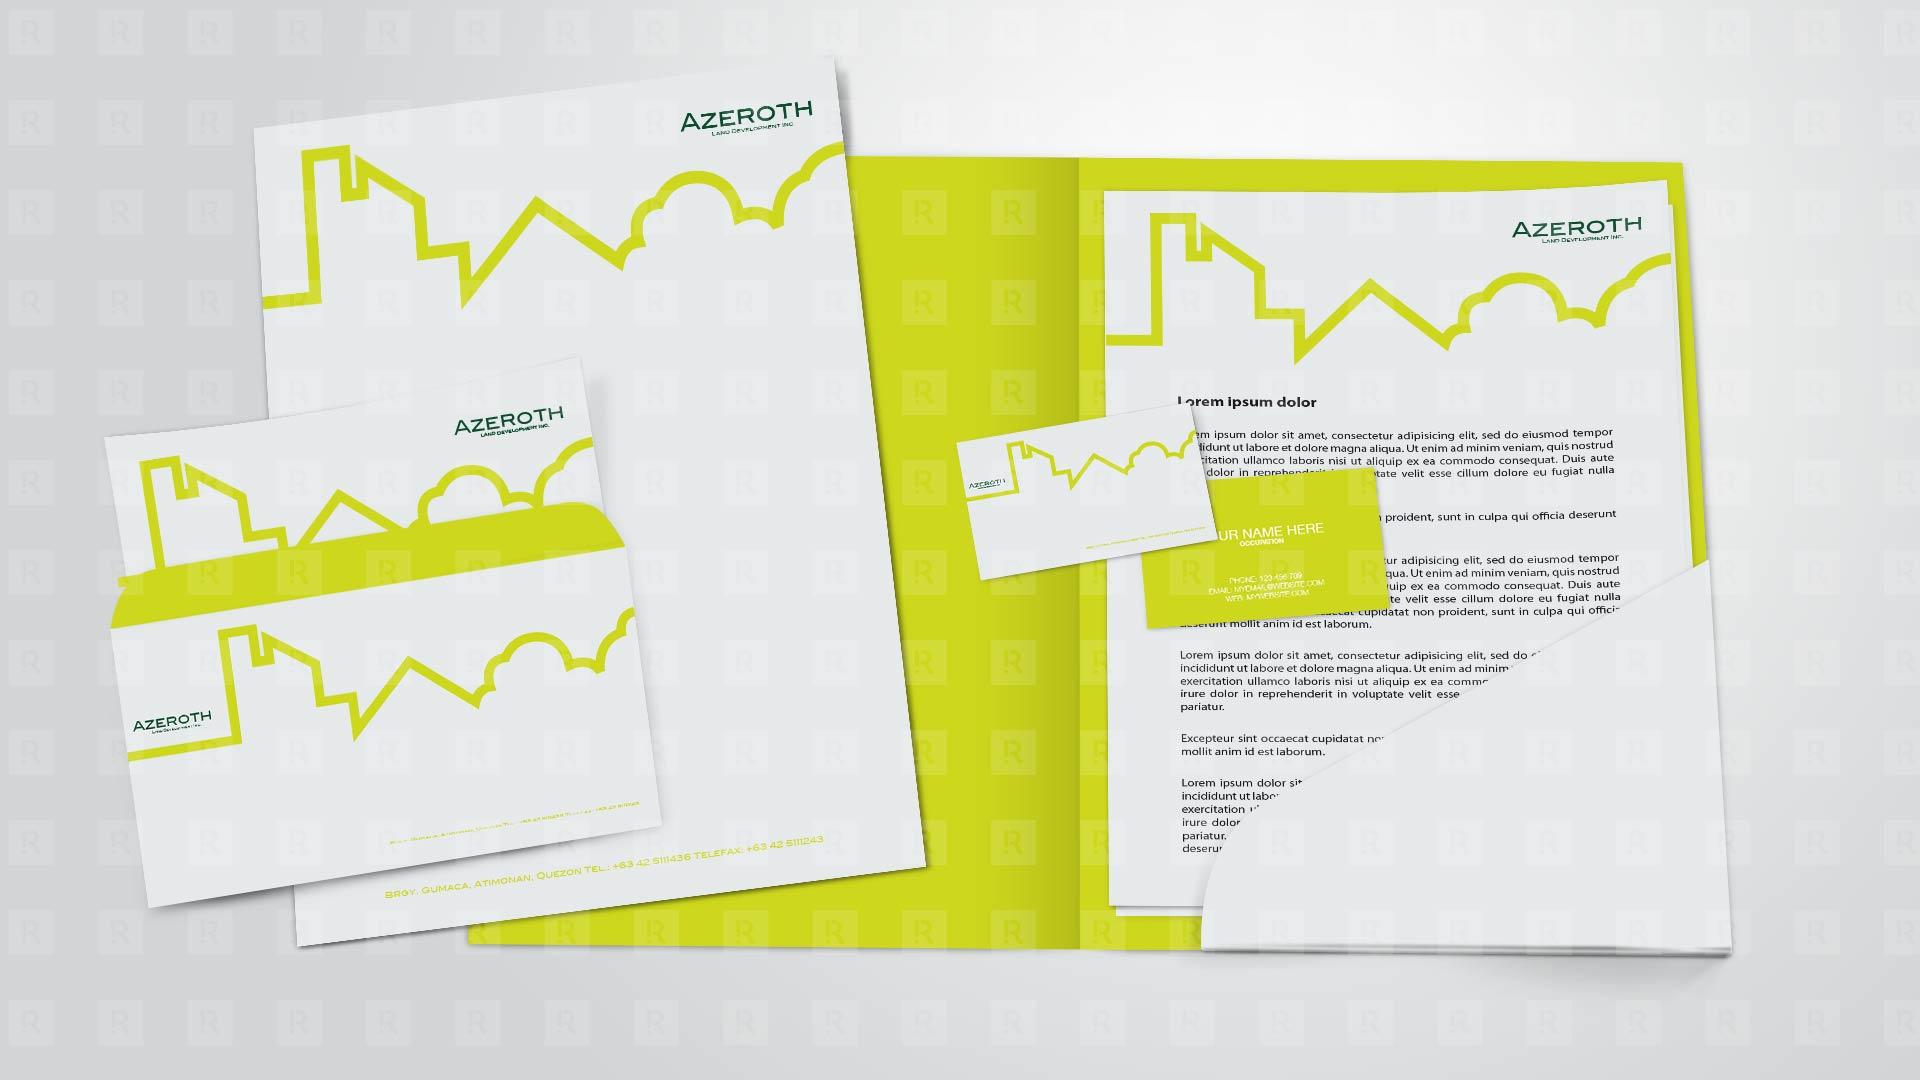 Azeroth Land Development Inc. corporate Identity Design